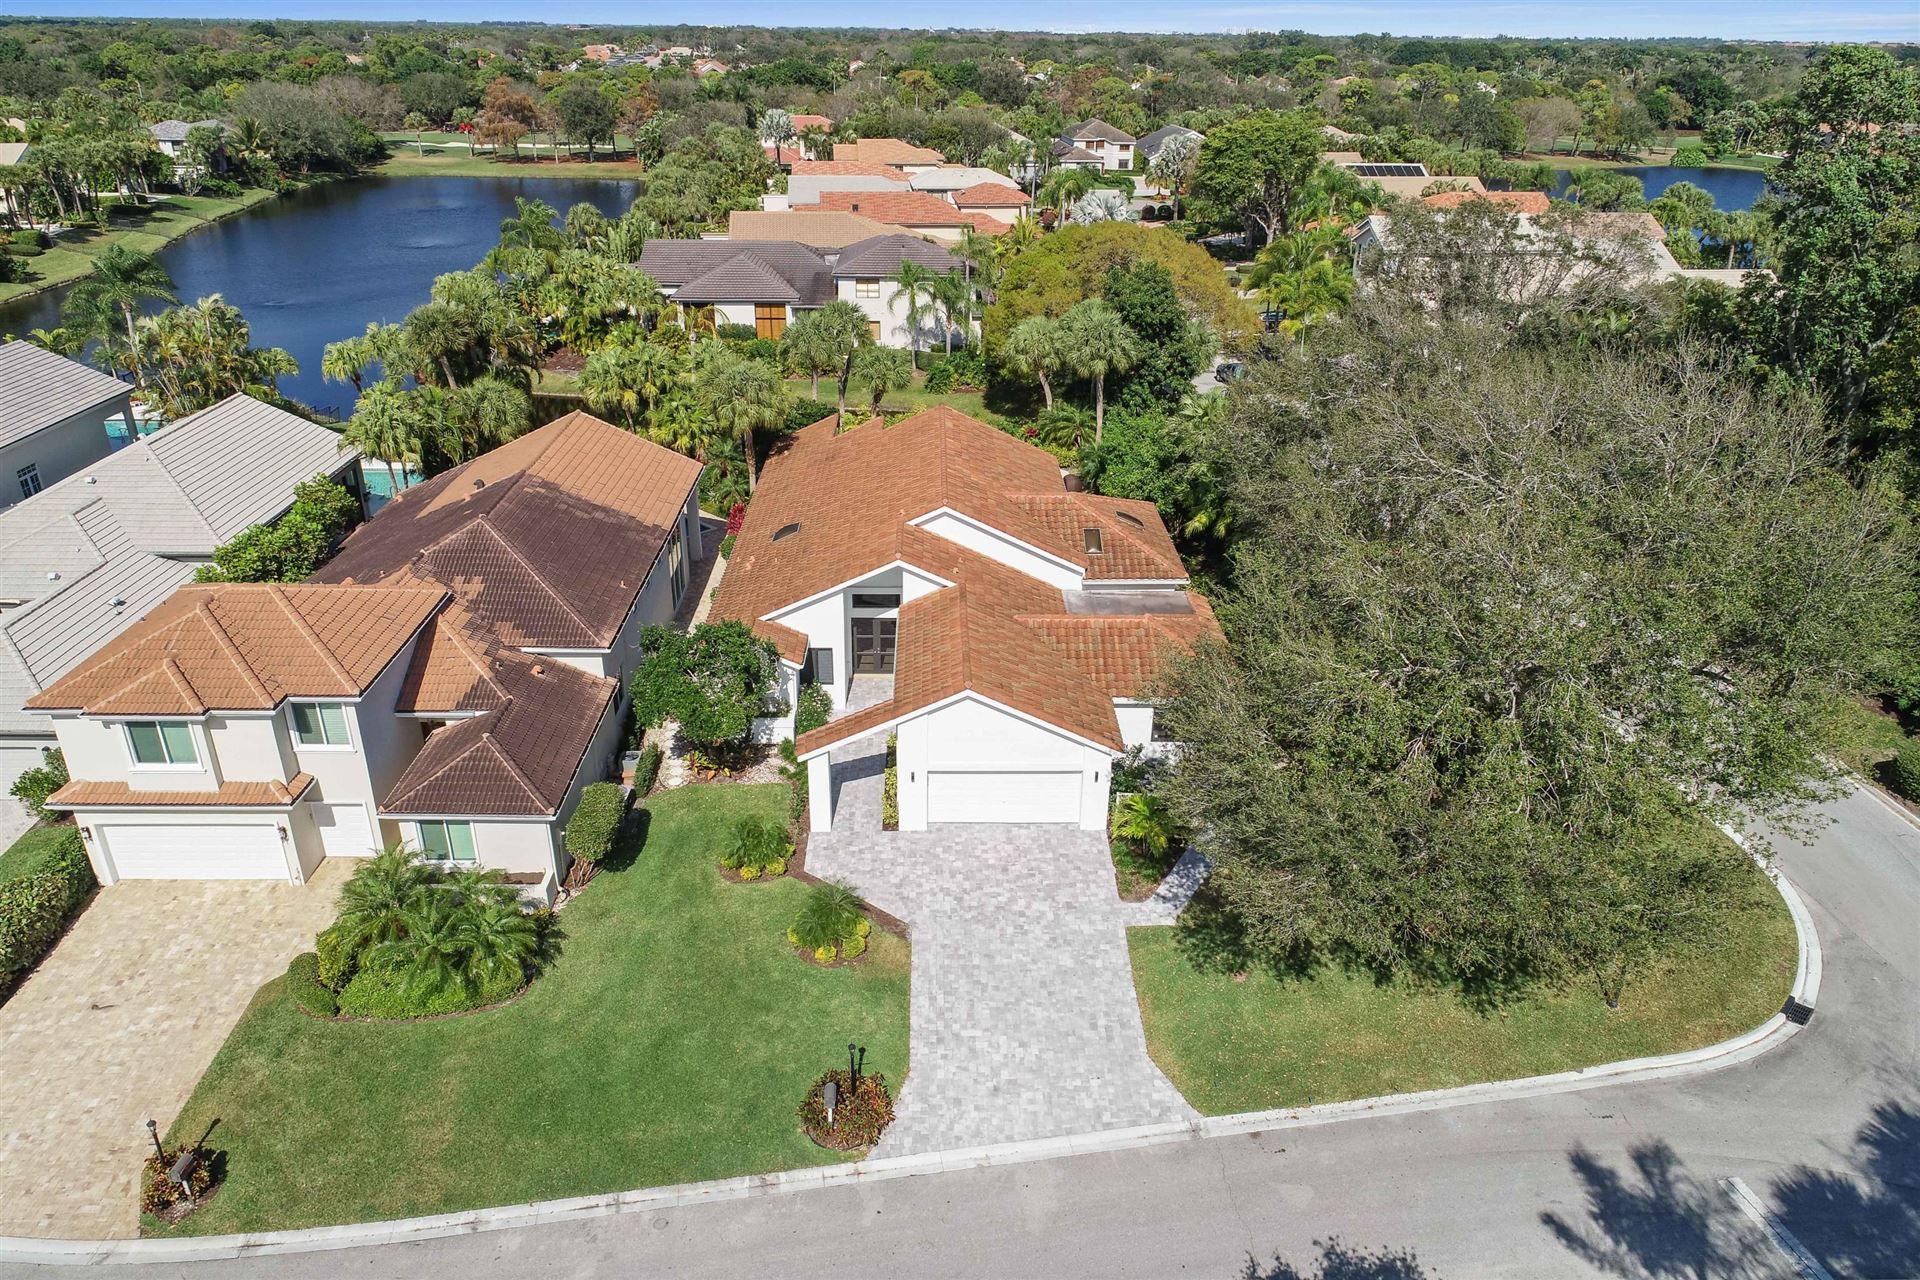 Photo of 13232 Provence Drive, Palm Beach Gardens, FL 33410 (MLS # RX-10688230)